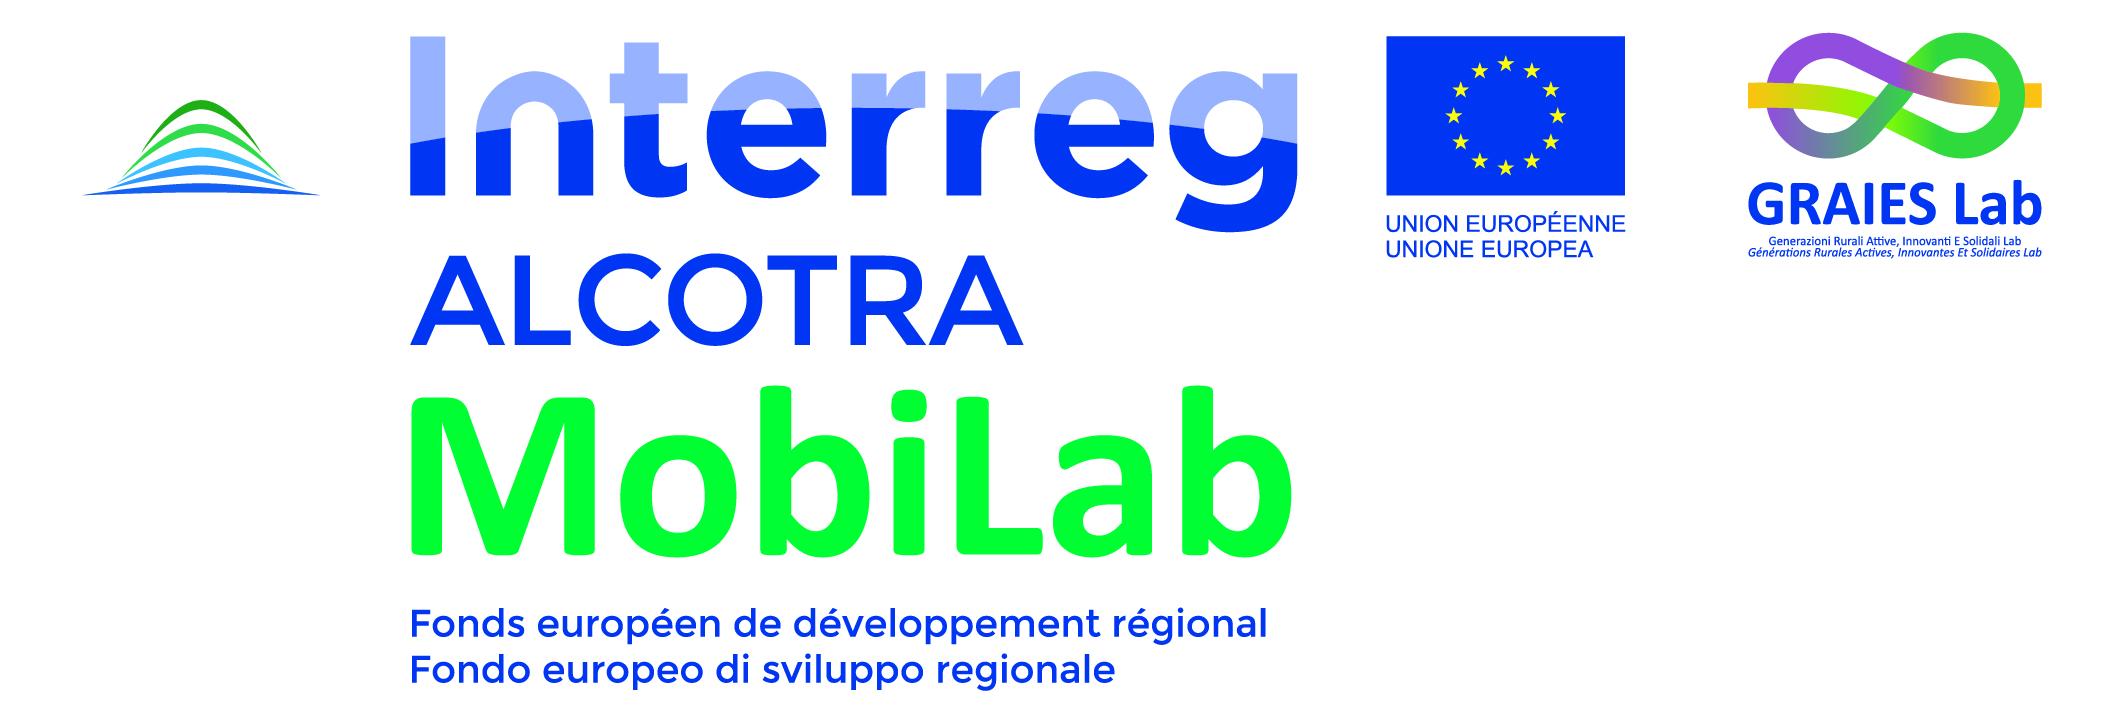 Logo MobiLab